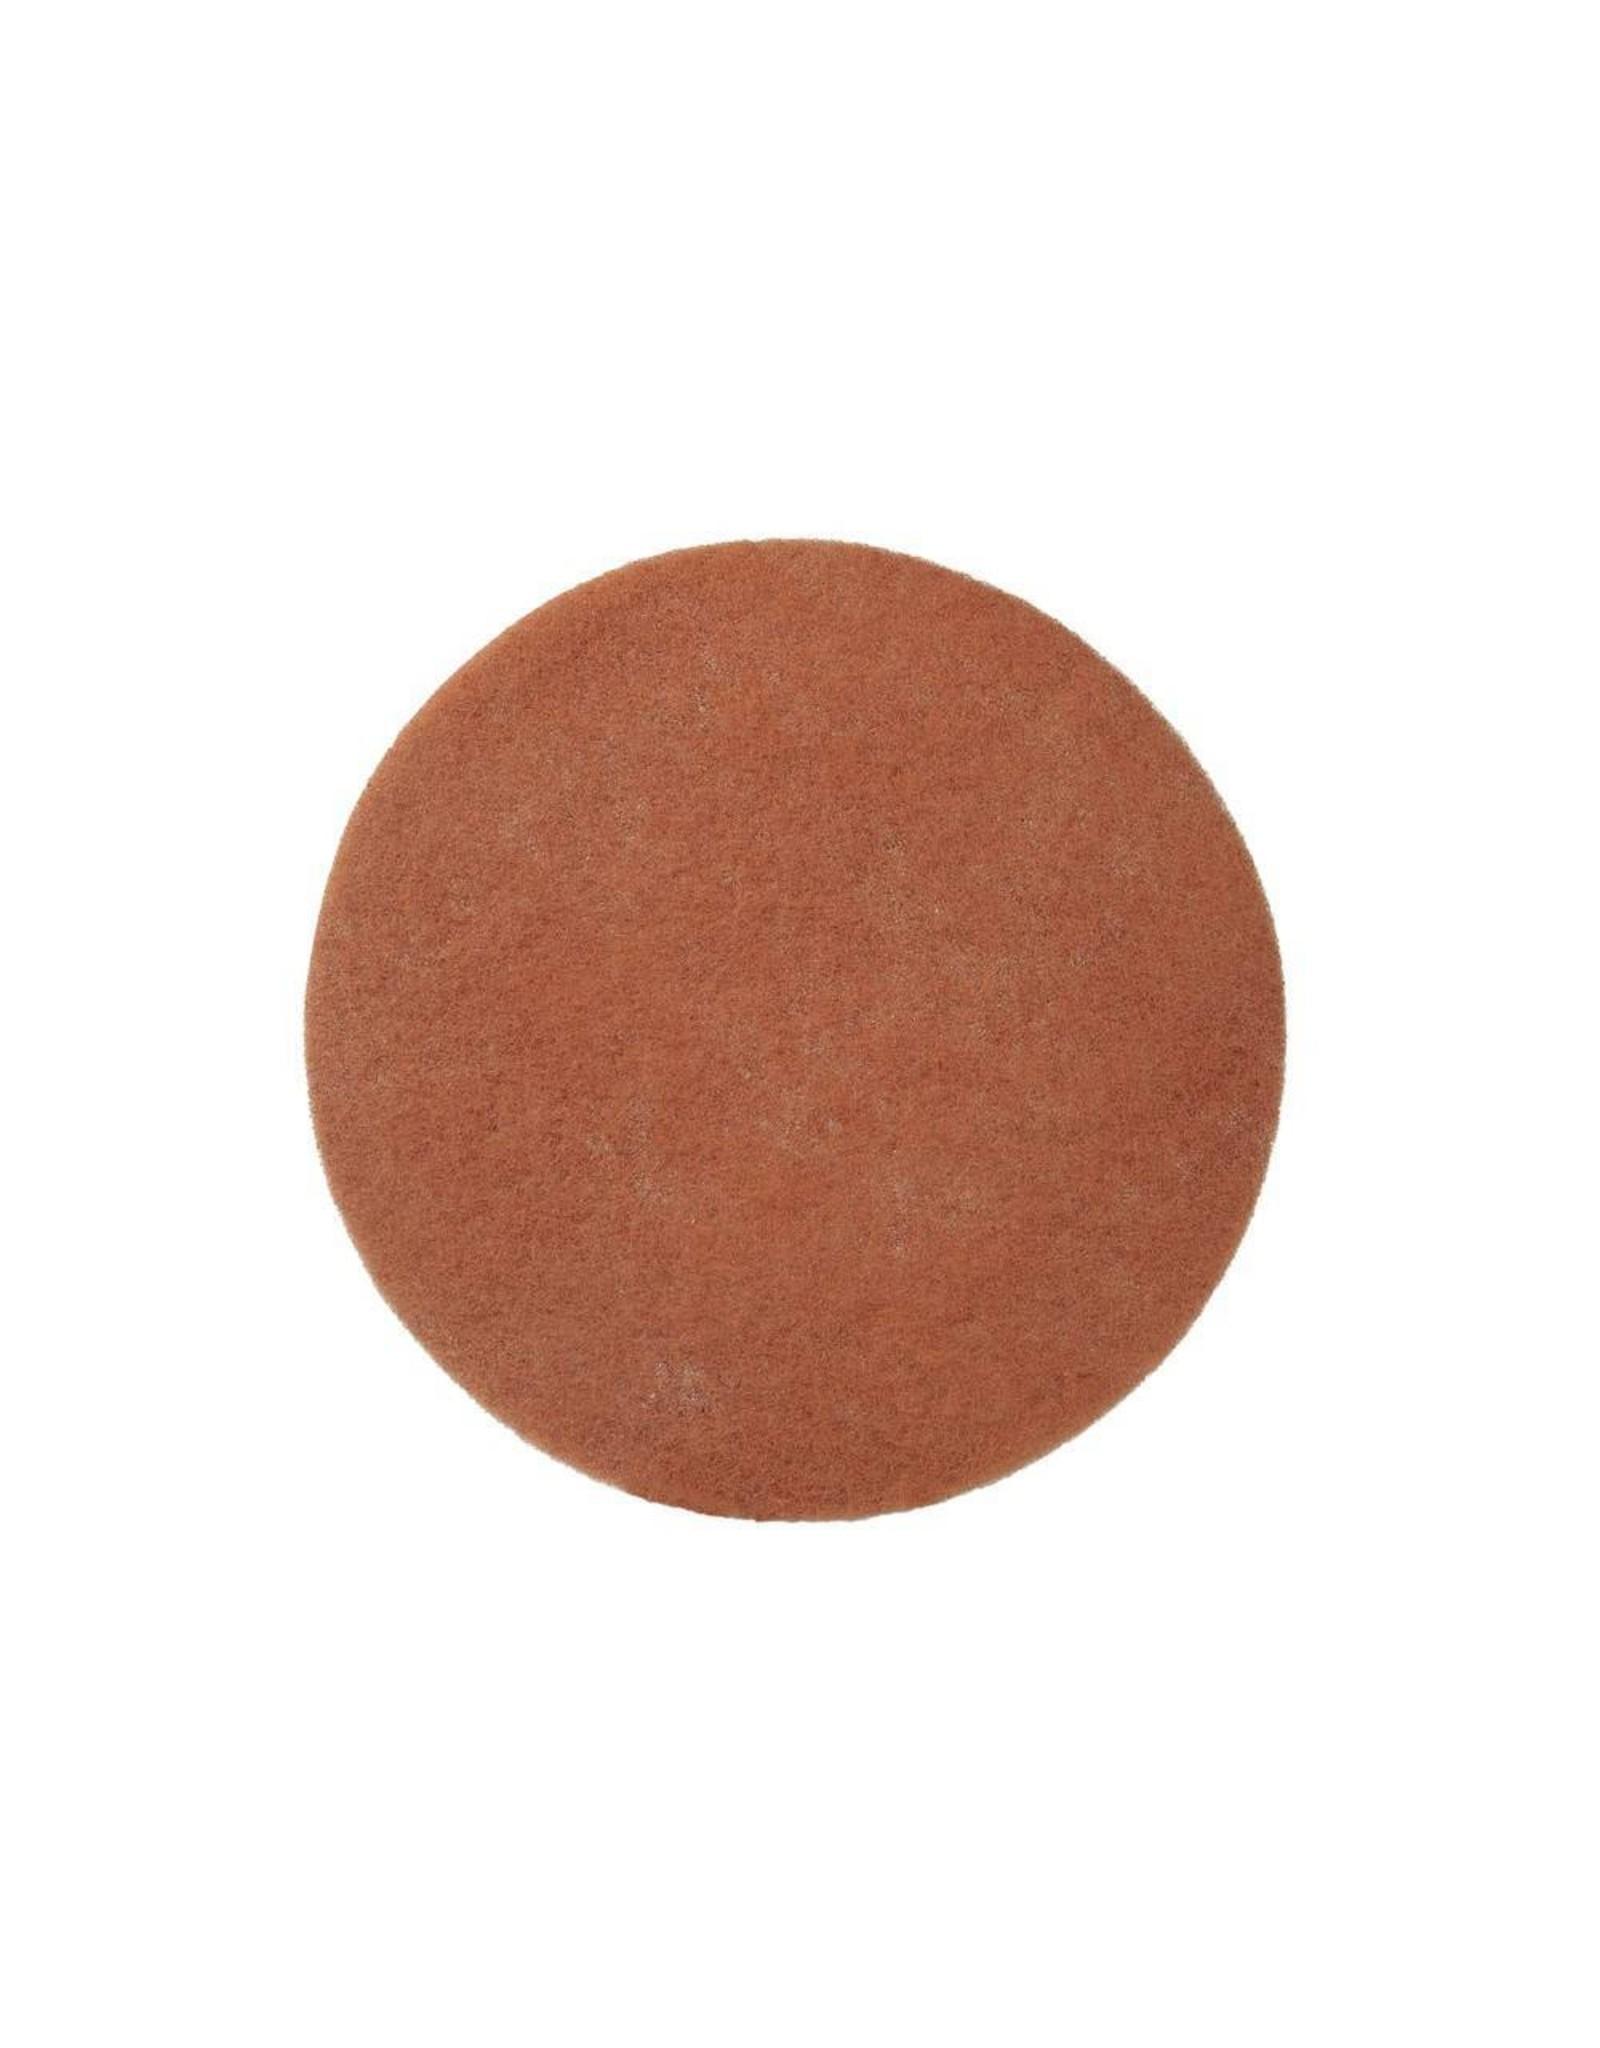 ACOR Nylon Pads Beige - 33 CM, 2 CM, 13 inch (High Quality)